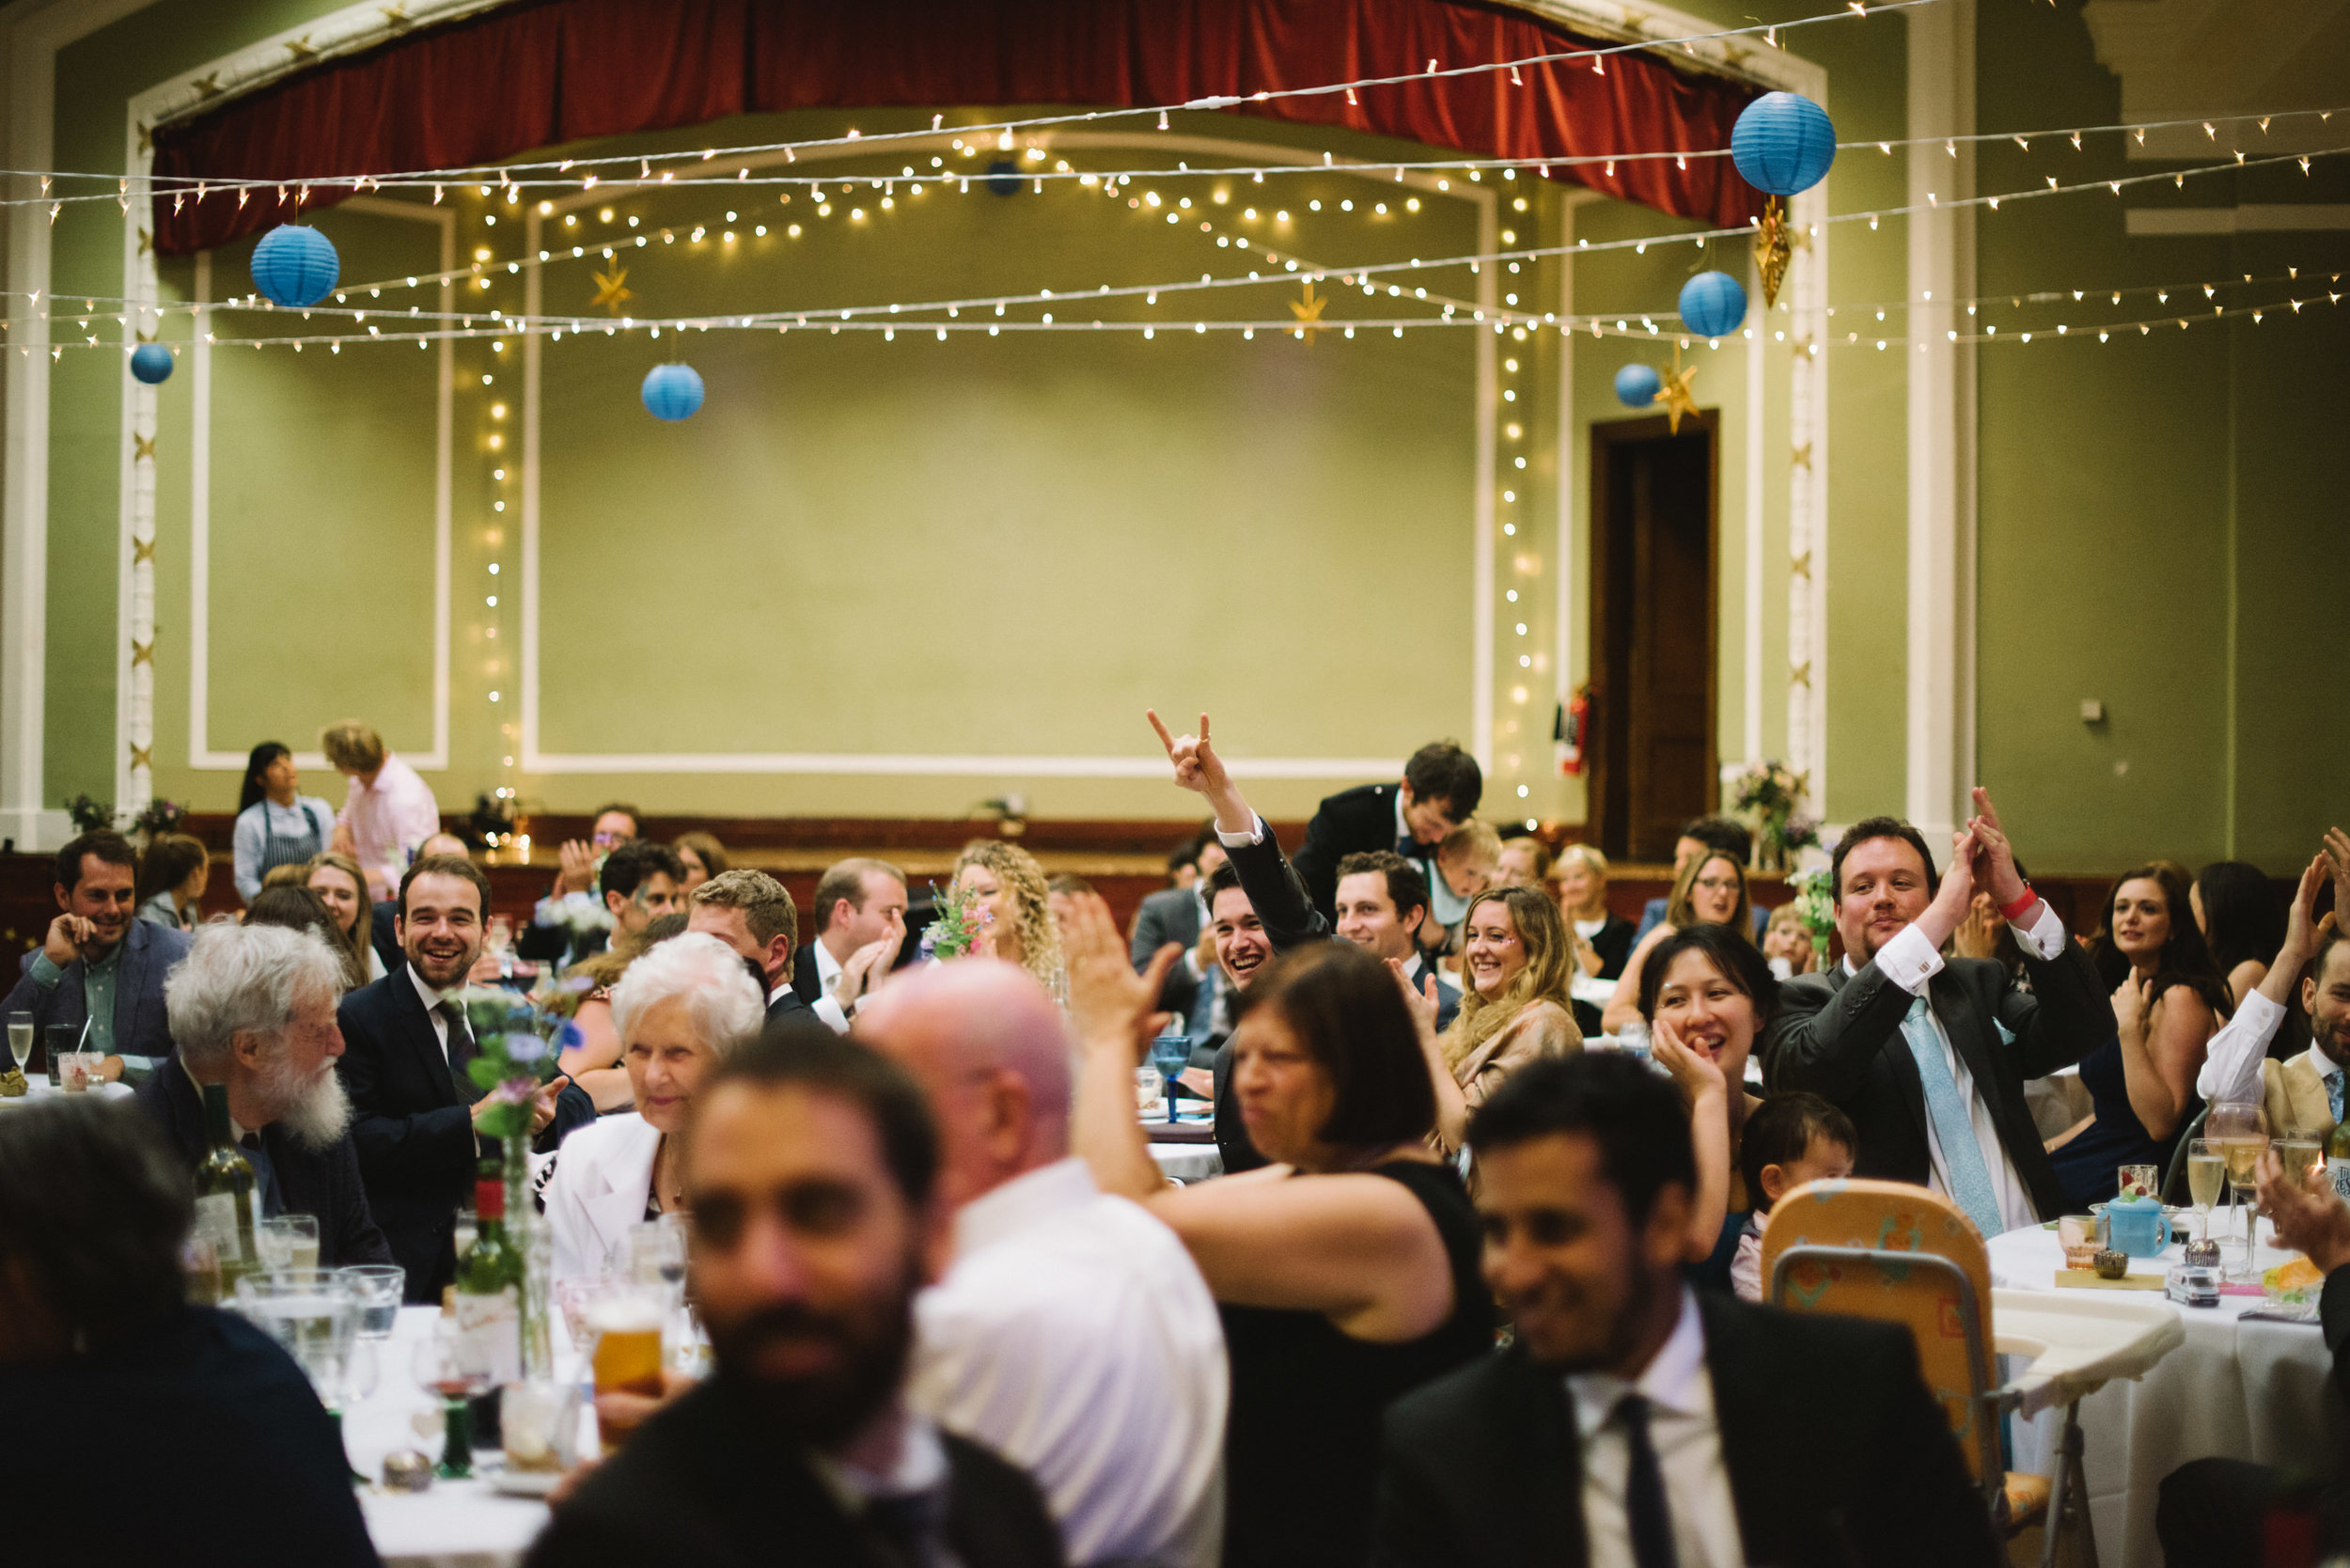 0181-LISA-DEVINE-PHOTOGRAPHY-ALTERNATIVE-WEDDING-PHOTOGRAPHY-SCOTLAND-DESTINATION-WEDDINGS-GLASGOW-WEDDINGS-COOL-WEDDINGS-STYLISH-WEDDINGS.JPG